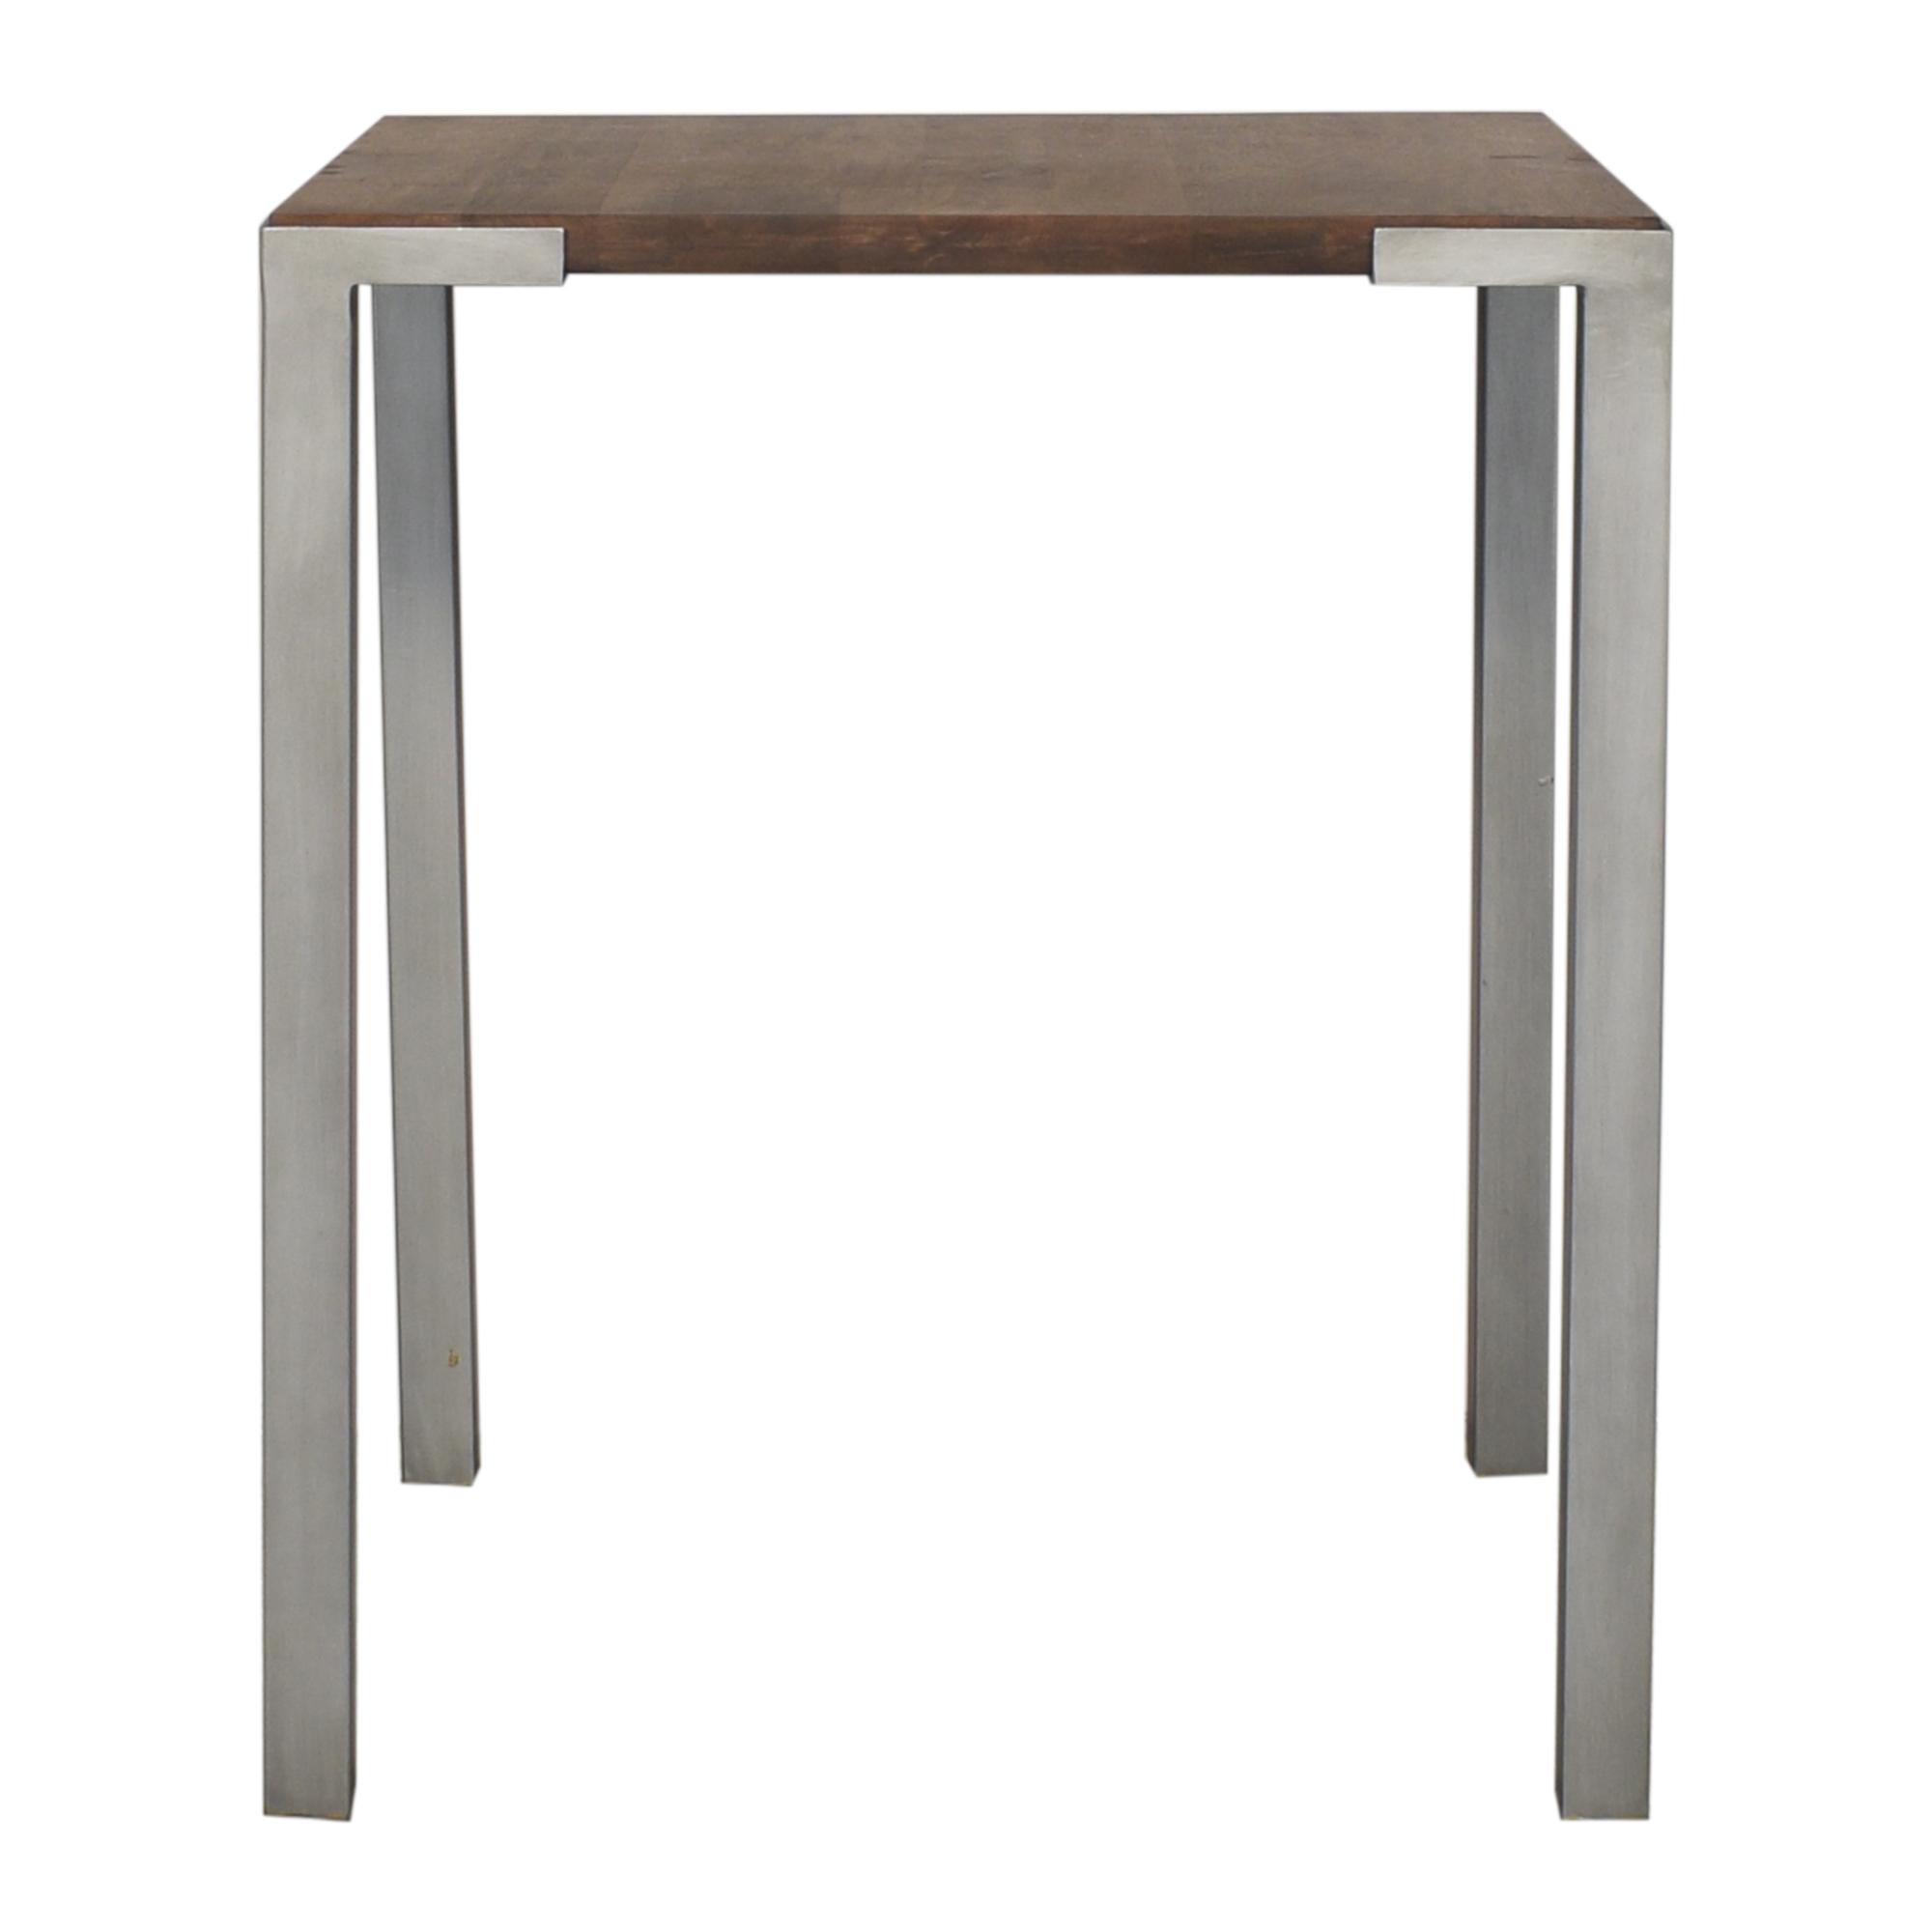 CB2 CB2 Stilt High Square Counter Table nj